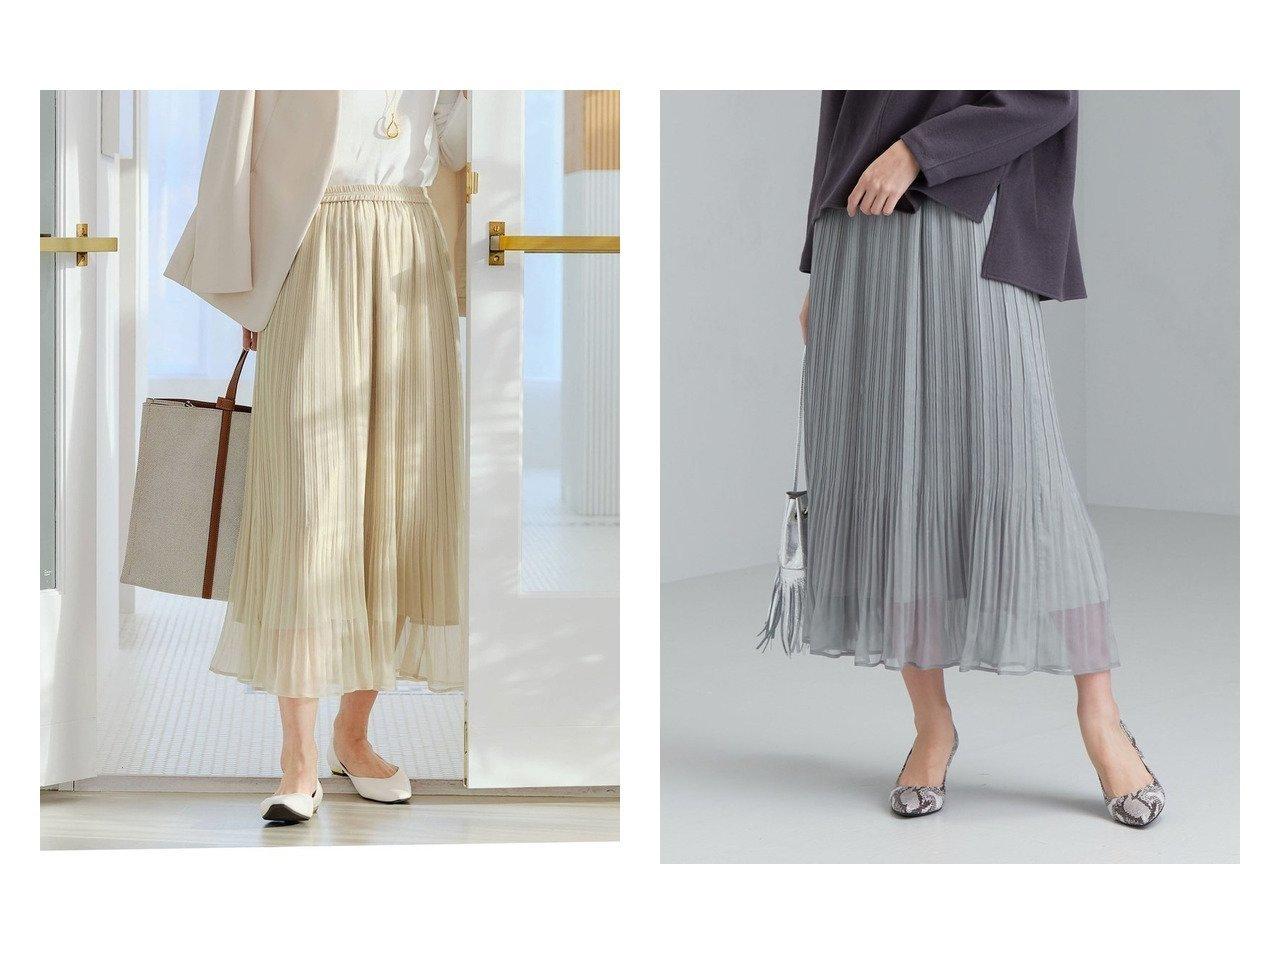 【green label relaxing / UNITED ARROWS/グリーンレーベル リラクシング / ユナイテッドアローズ】のFFC シアー プリーツ スカート 【スカート】おすすめ!人気、トレンド・レディースファッションの通販 おすすめで人気の流行・トレンド、ファッションの通販商品 メンズファッション・キッズファッション・インテリア・家具・レディースファッション・服の通販 founy(ファニー) https://founy.com/ ファッション Fashion レディースファッション WOMEN スカート Skirt プリーツスカート Pleated Skirts ロングスカート Long Skirt シアー シンプル トレンド プリーツ ロング |ID:crp329100000027830